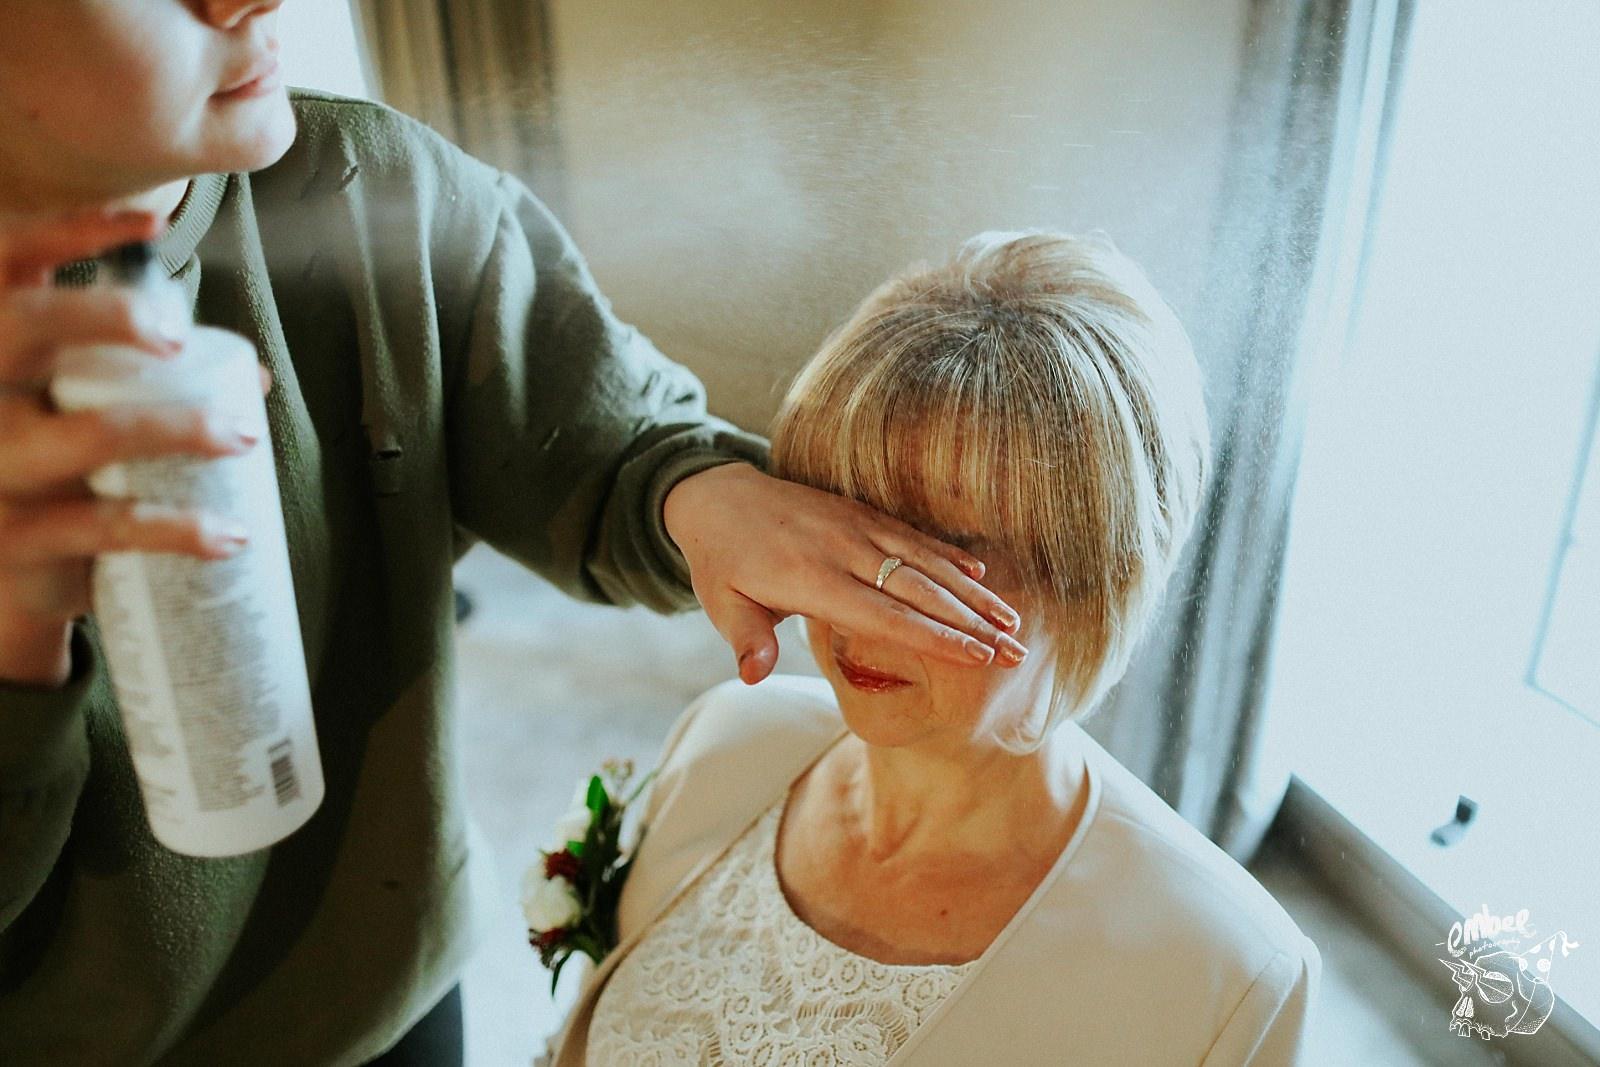 spraying hairspray on womans hair